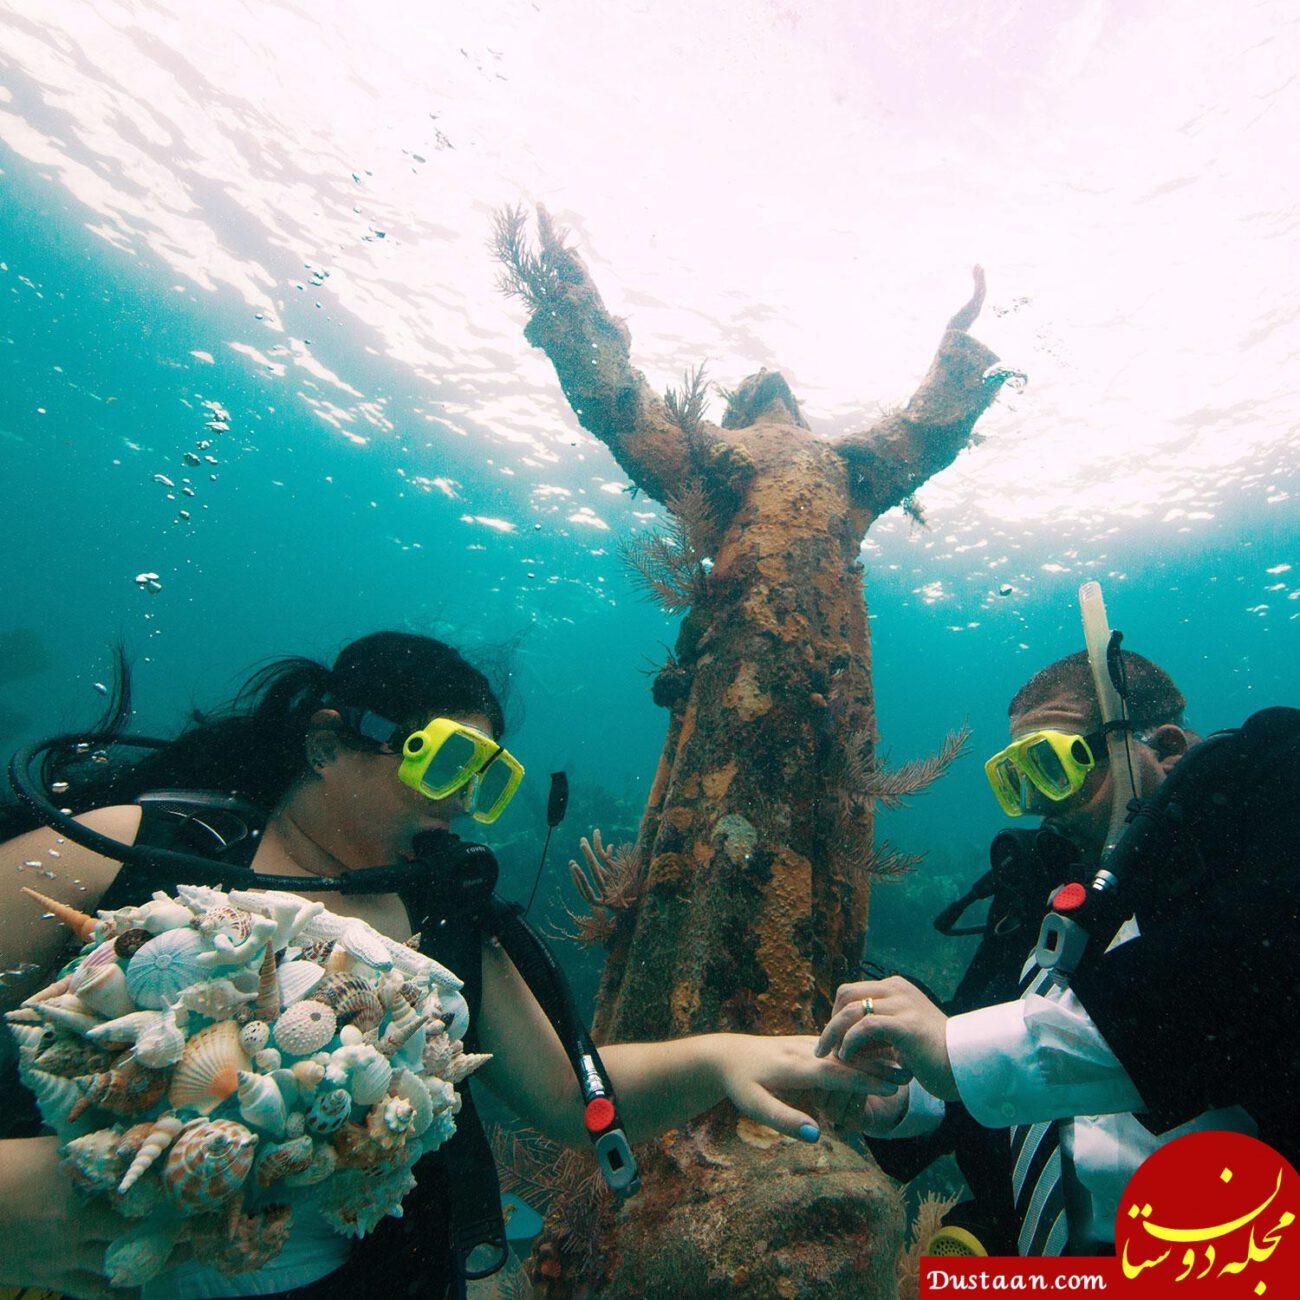 www.dustaan.com ازدواج متفاوت در اعماق دریا! +عکس